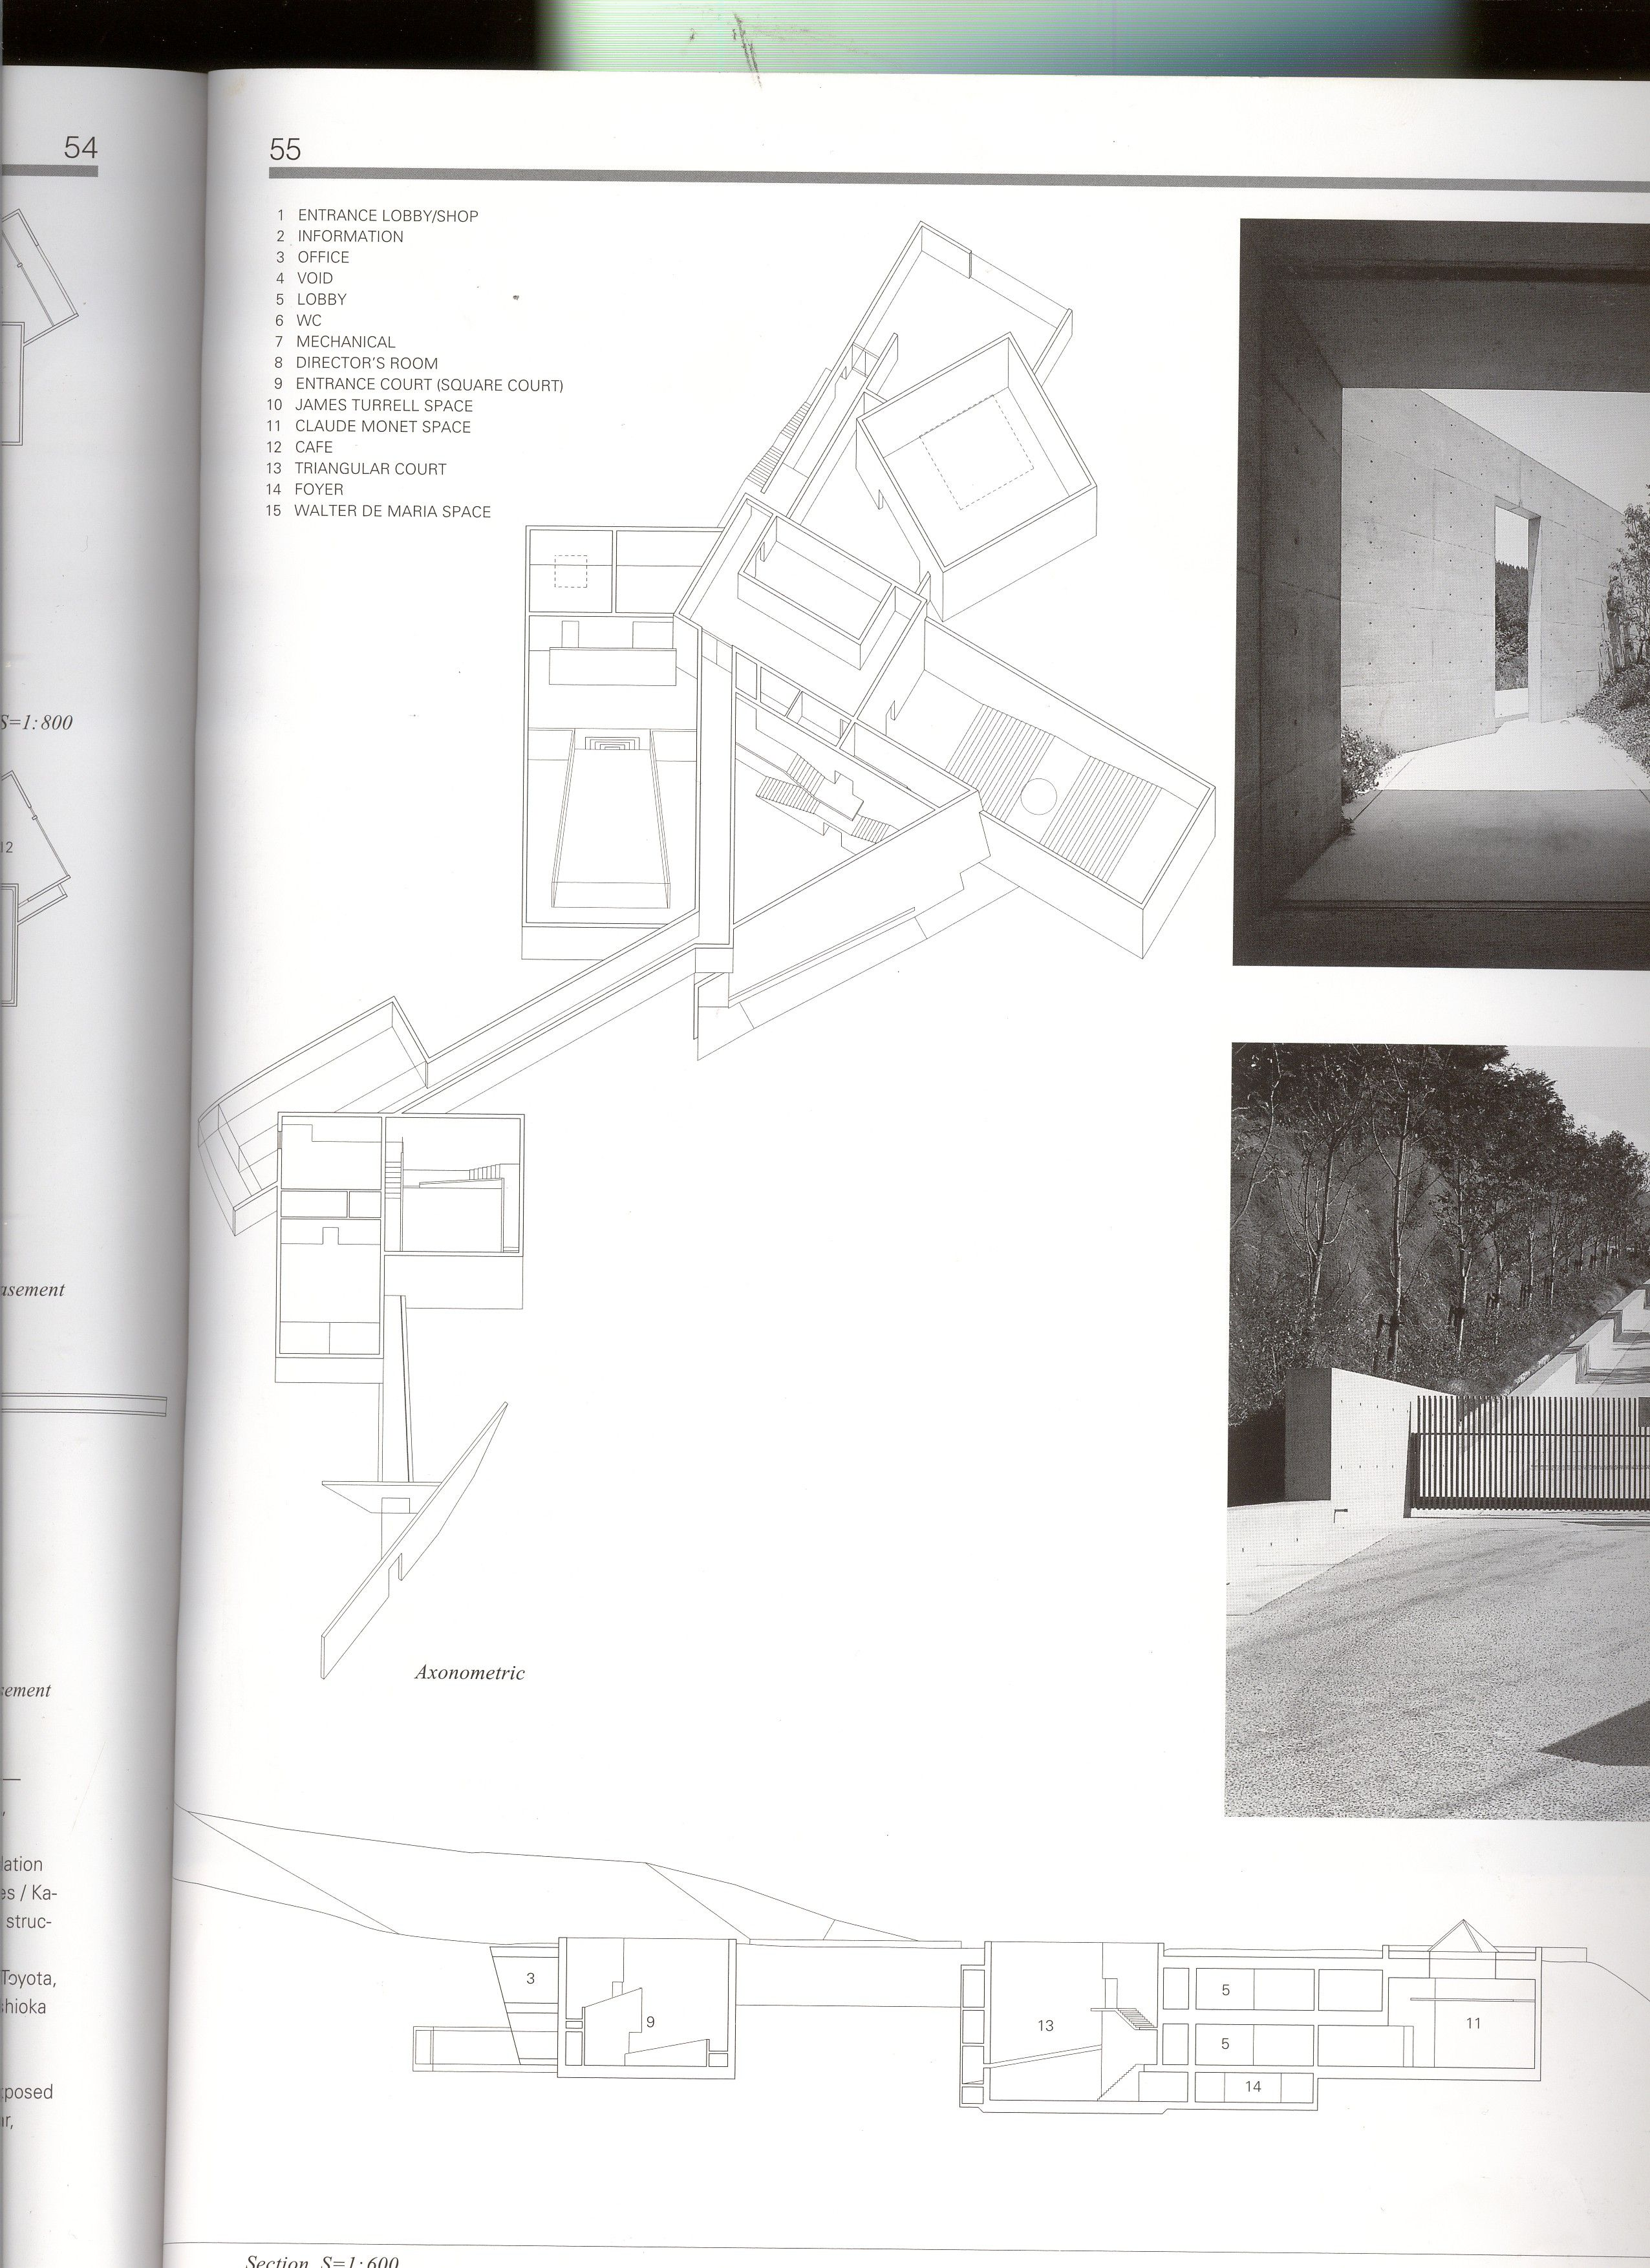 20060331 1606chichu Plan 3 Jpg 2552 3508 Museum Plan Chichu Art Museum Tadao Ando